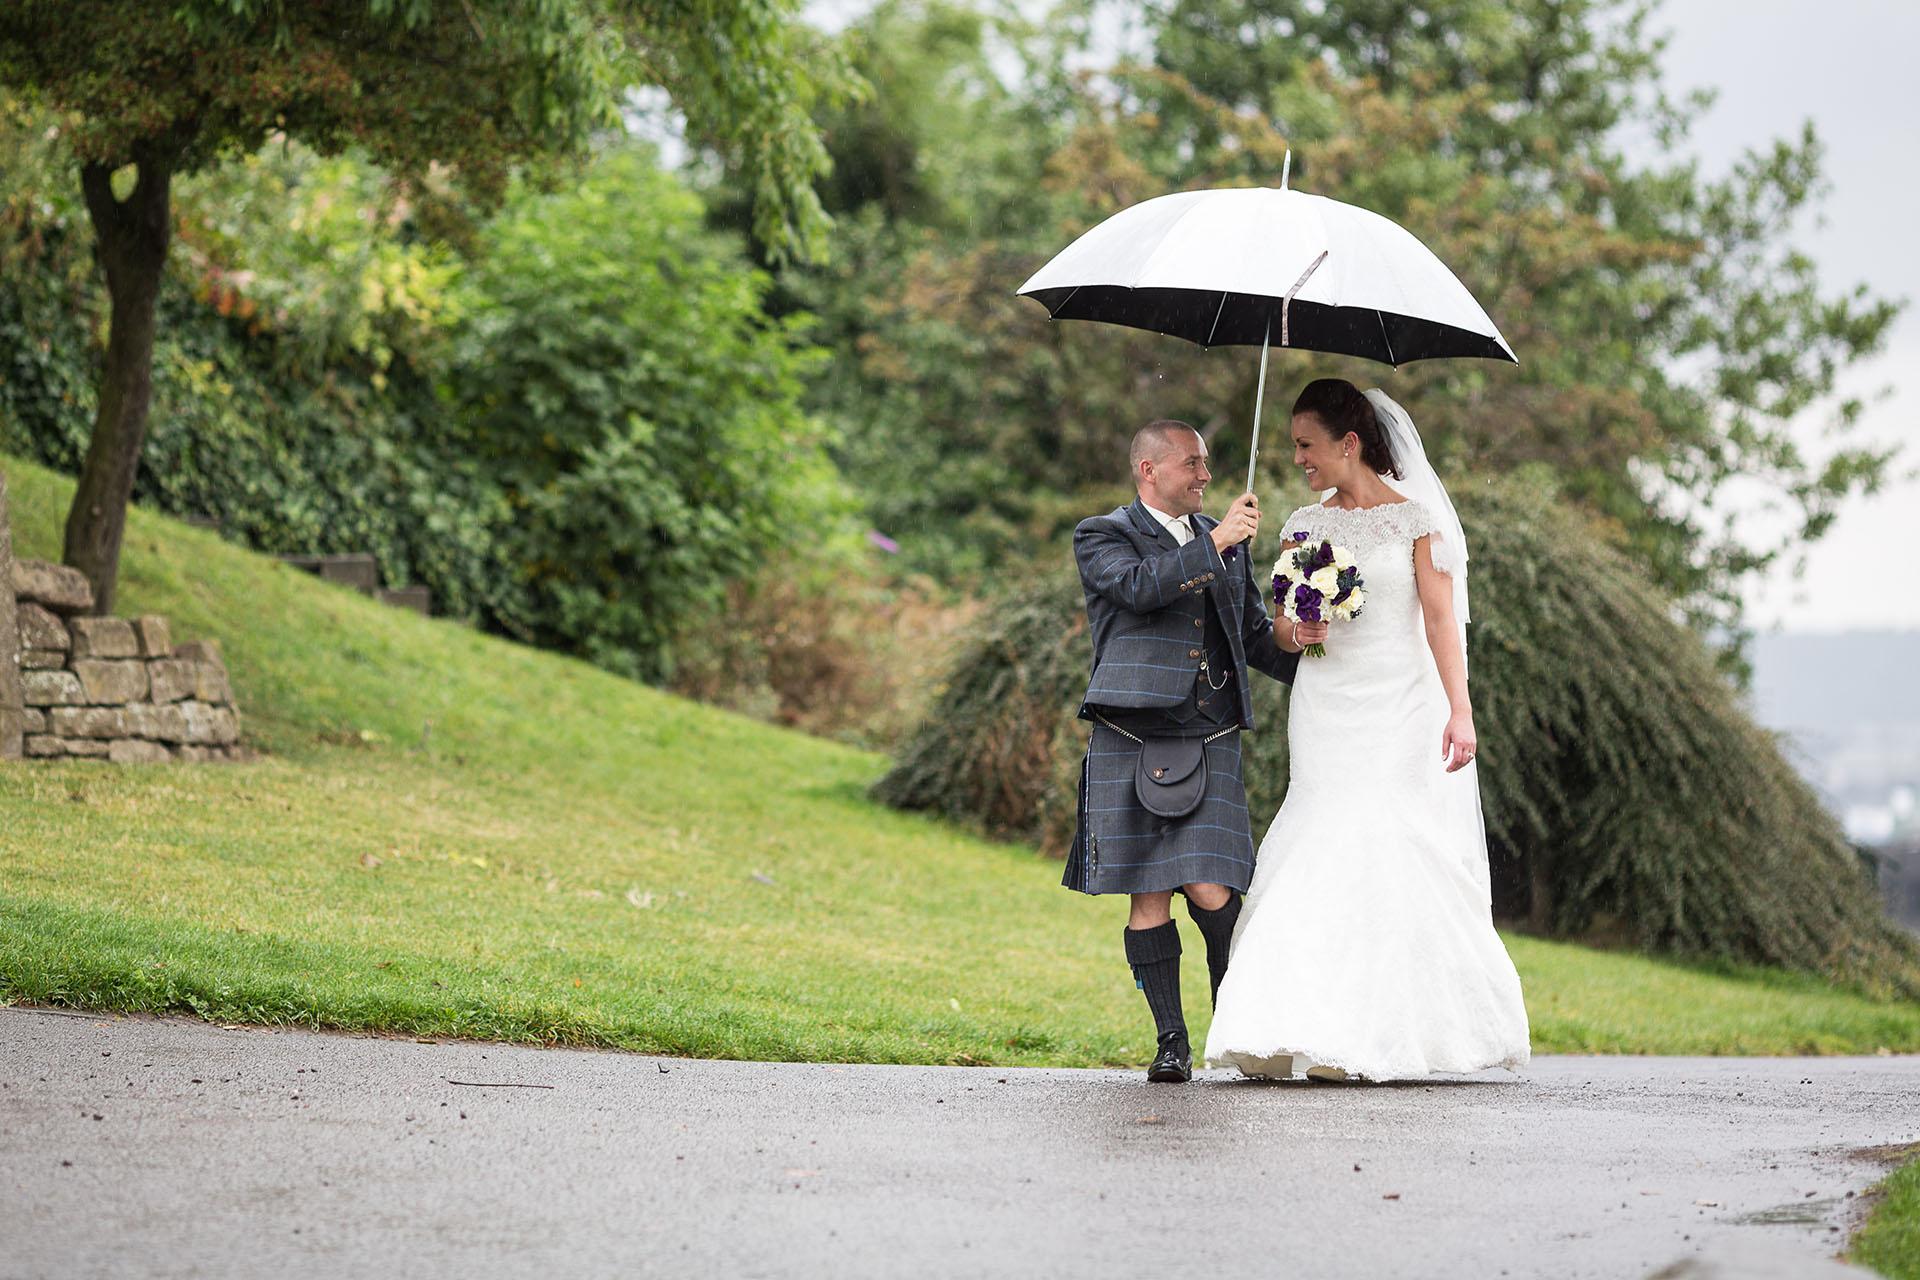 Mansfield Traquair Wedding Photographer - Garry and Lynsey